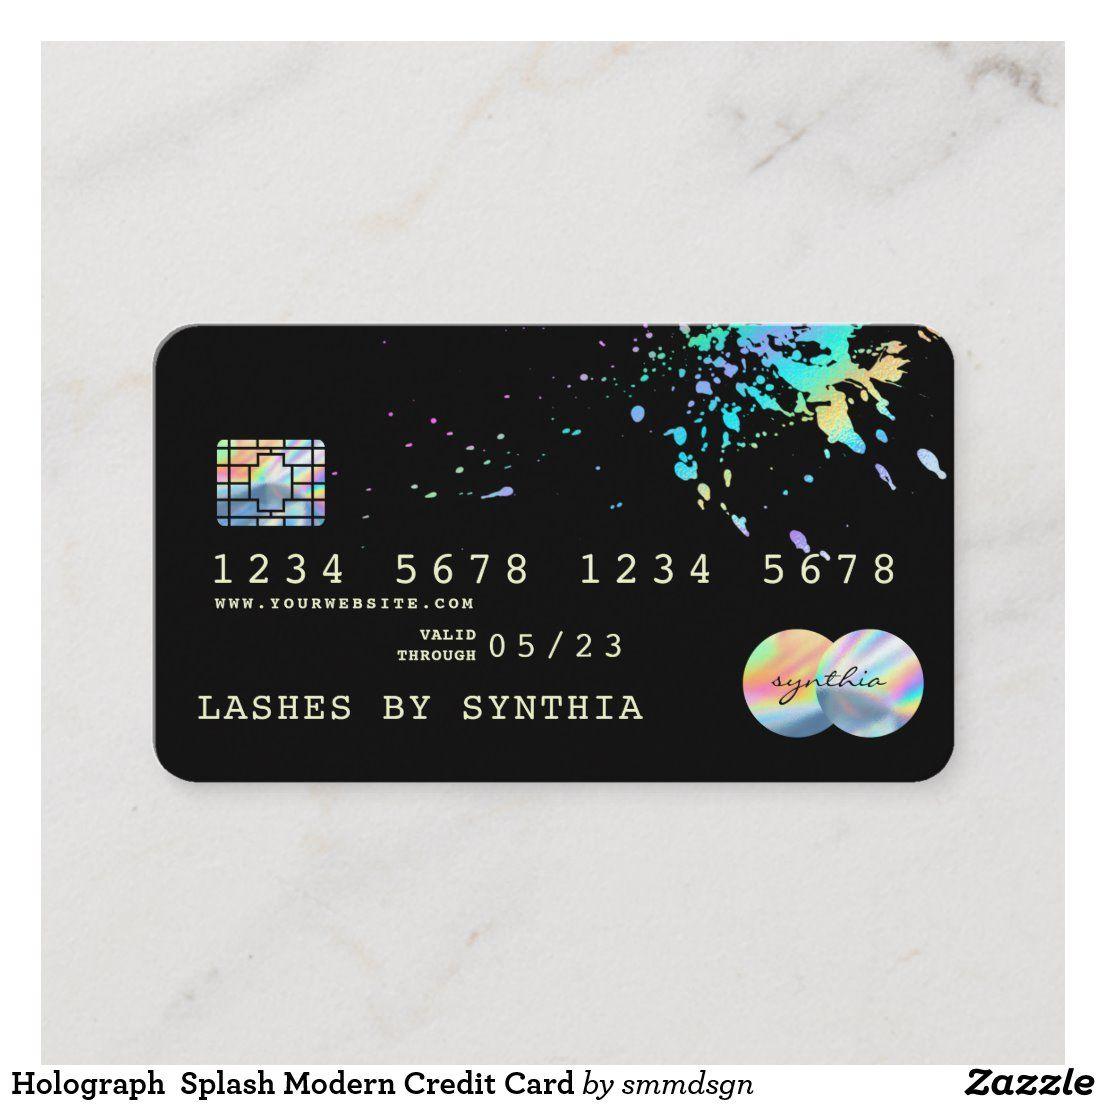 Holograph Splash Modern Credit Card Zazzle Com In 2020 Credit Card Cards Business Credit Cards